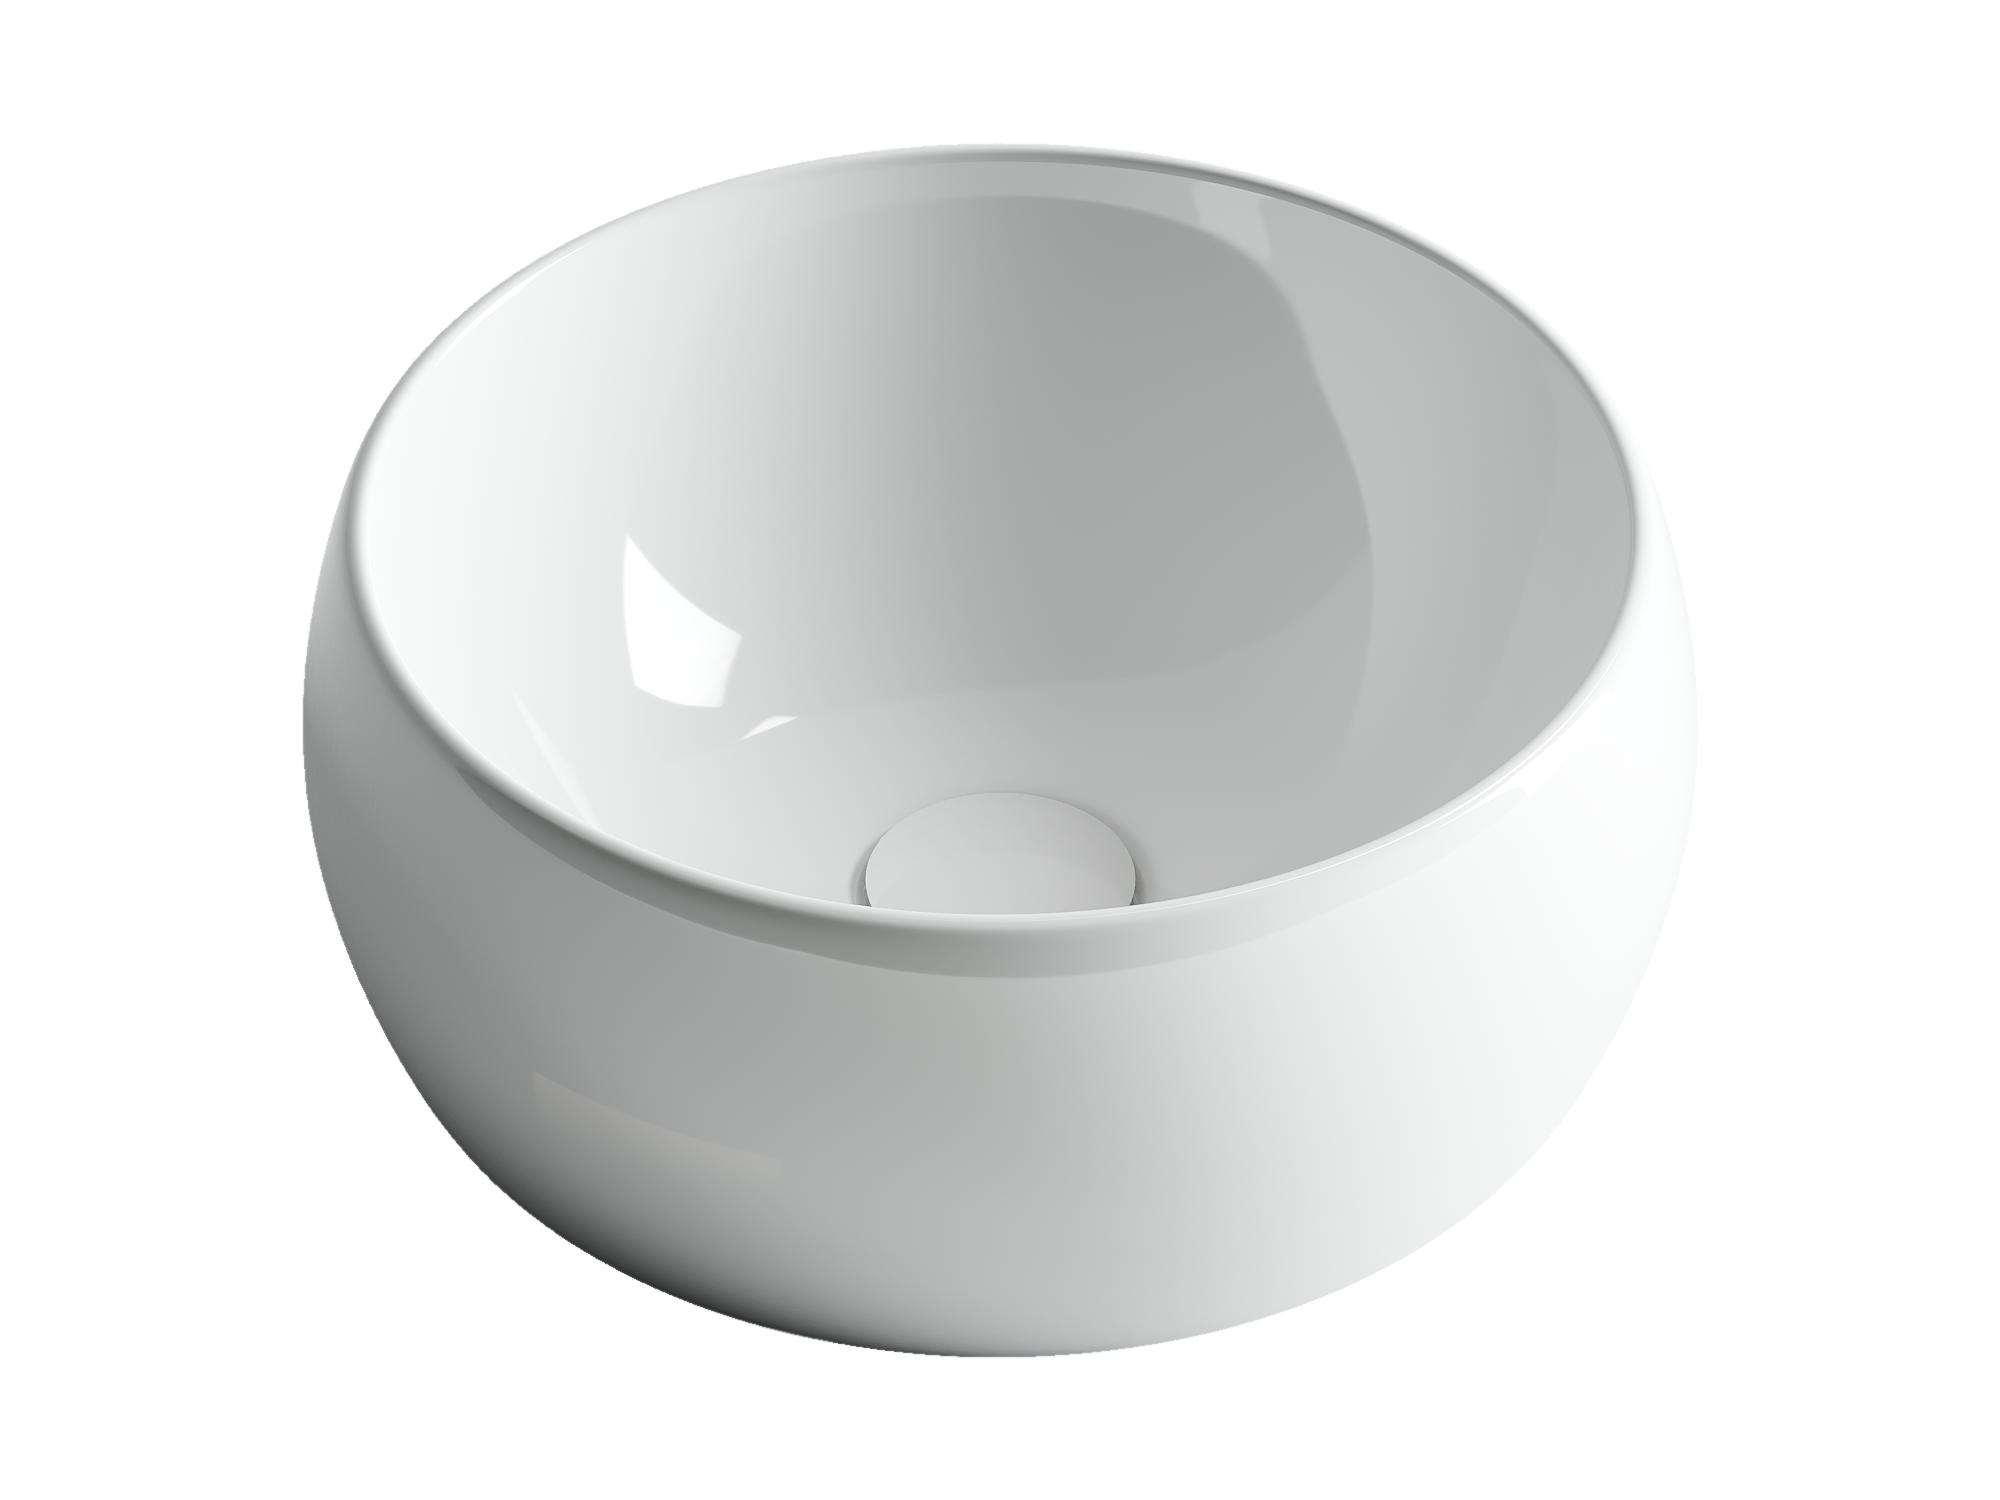 Раковина чаша накладная Ceramica Nova  Element CN6001 395x395x155мм